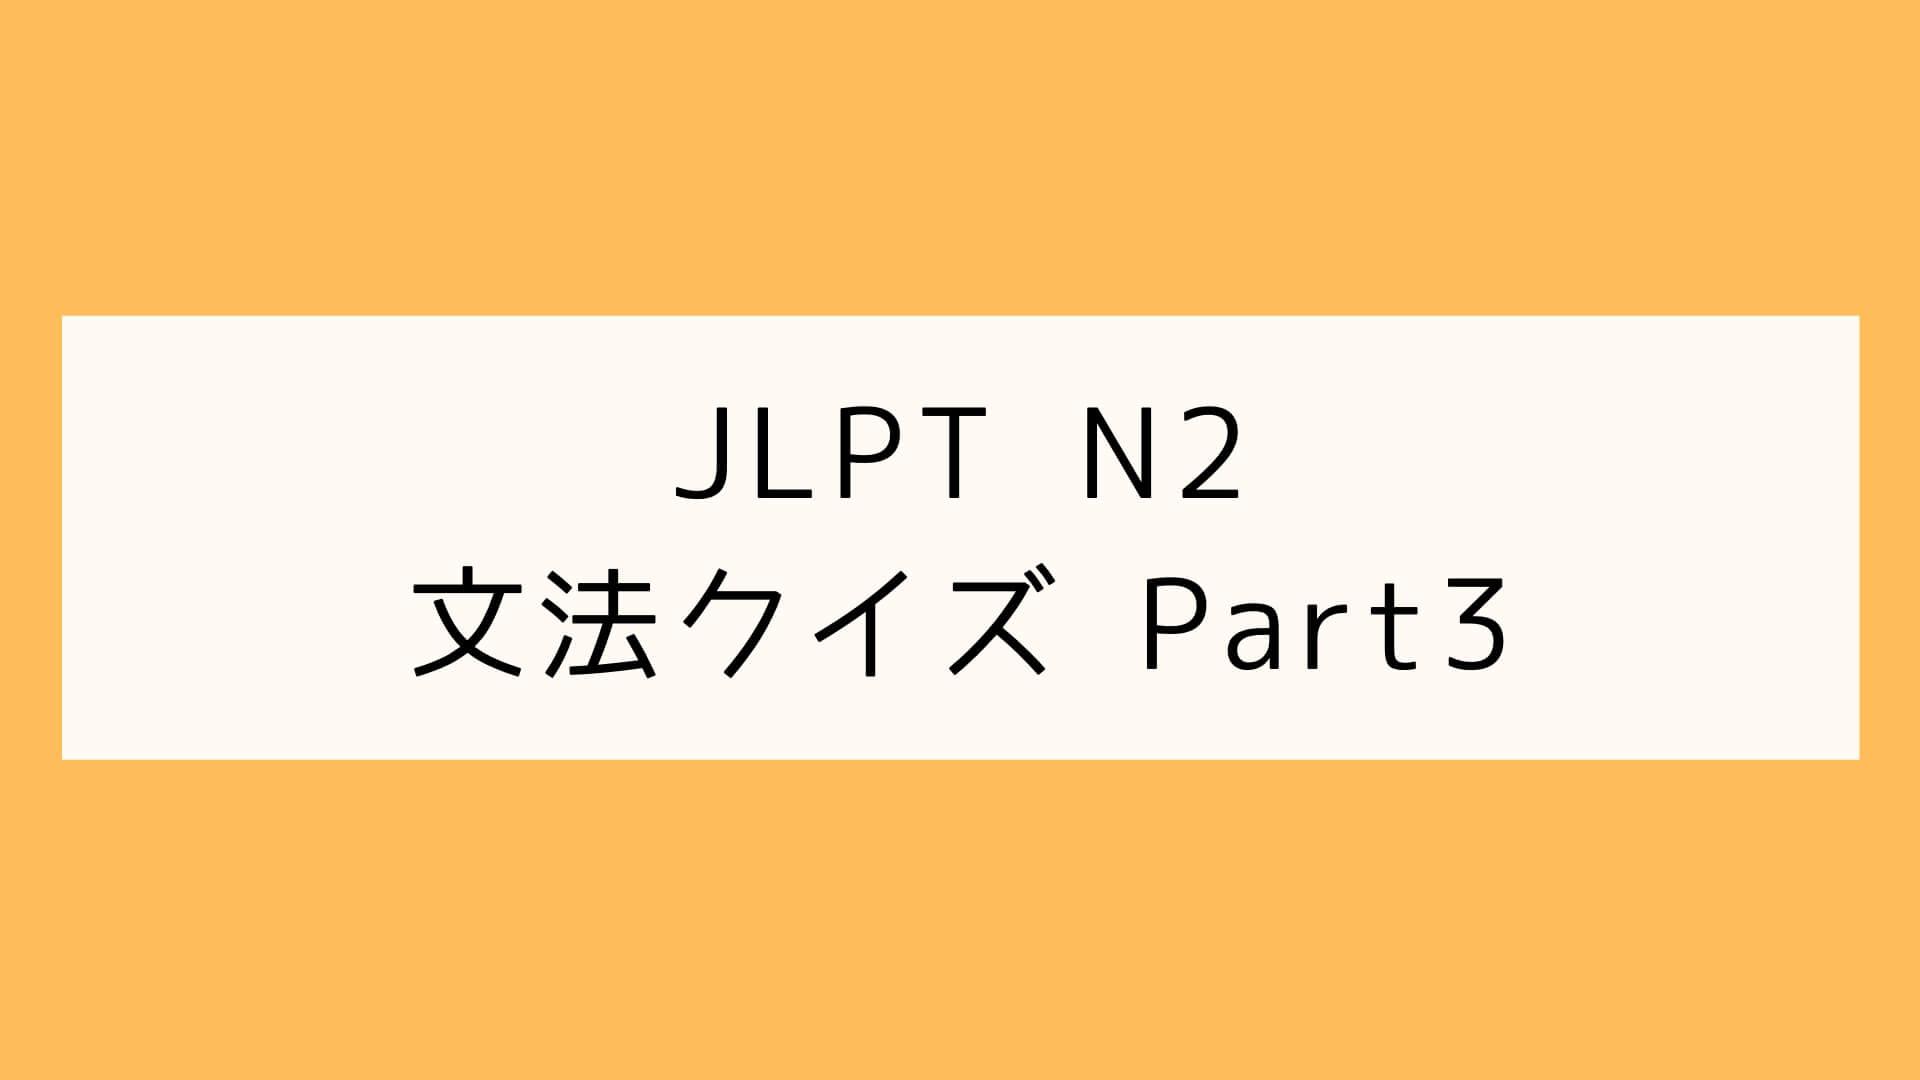 【JLPT N2】文法クイズ Part3